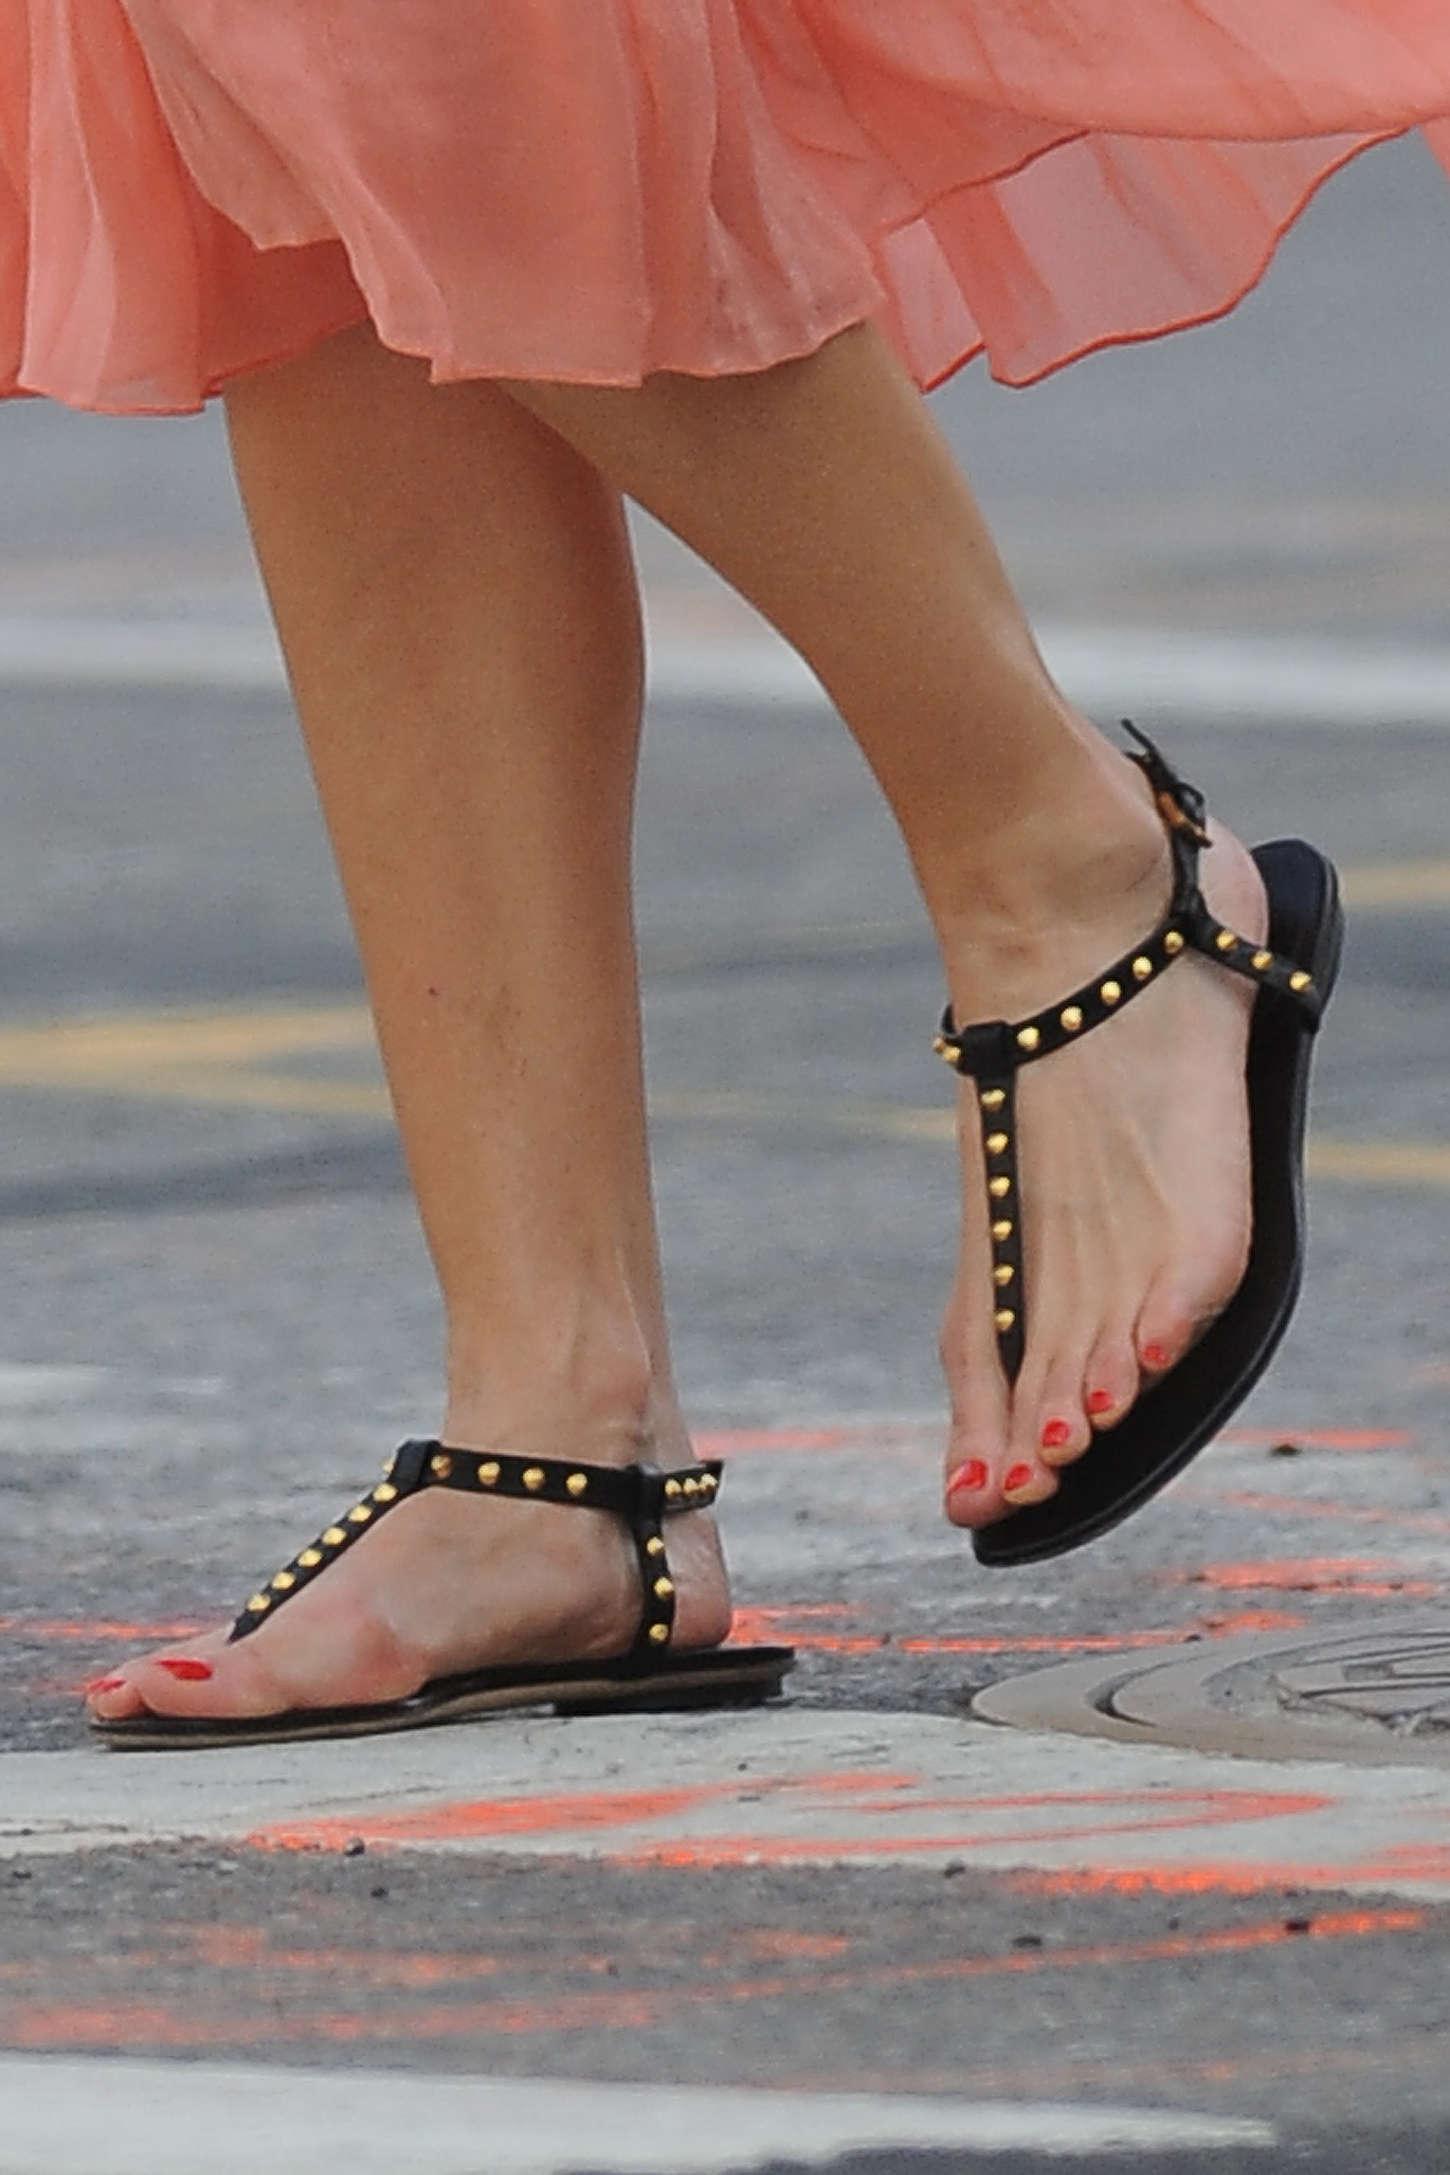 Swank feet hilary The Gift